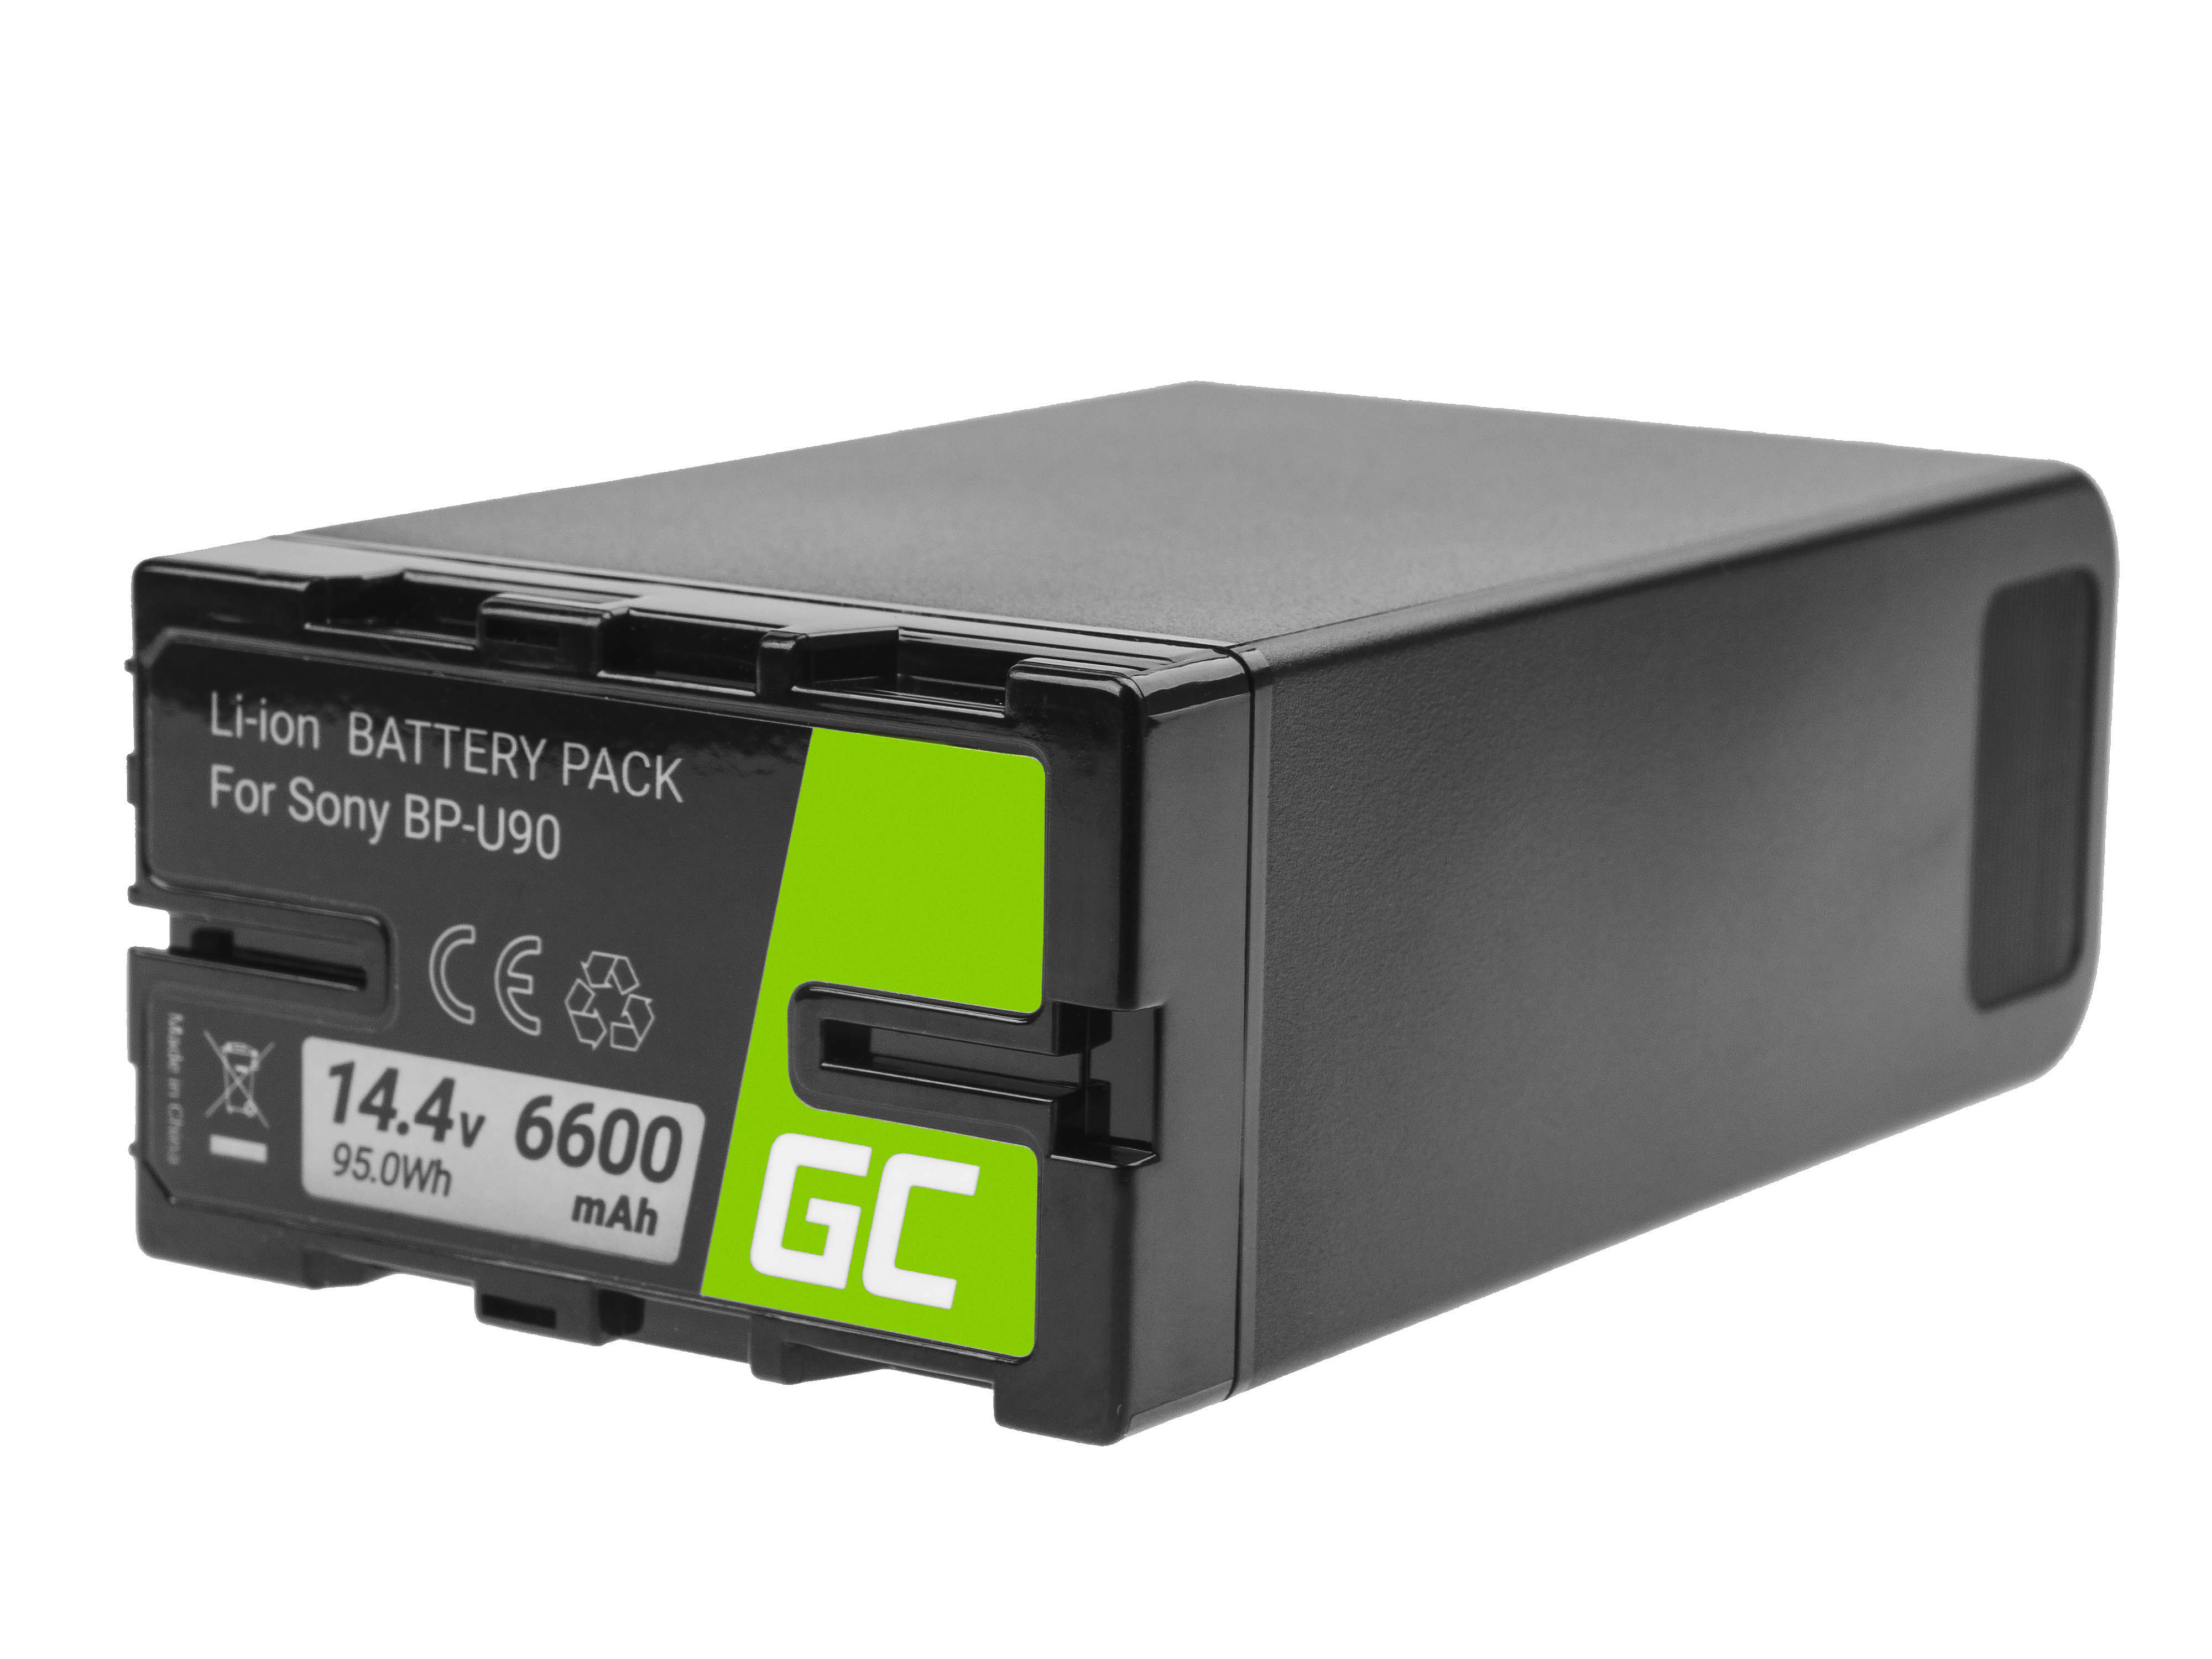 Battery Green Cell BP-U90 BP-U60 BP-U30 for Sony 6600mAh 95Wh 14.4V